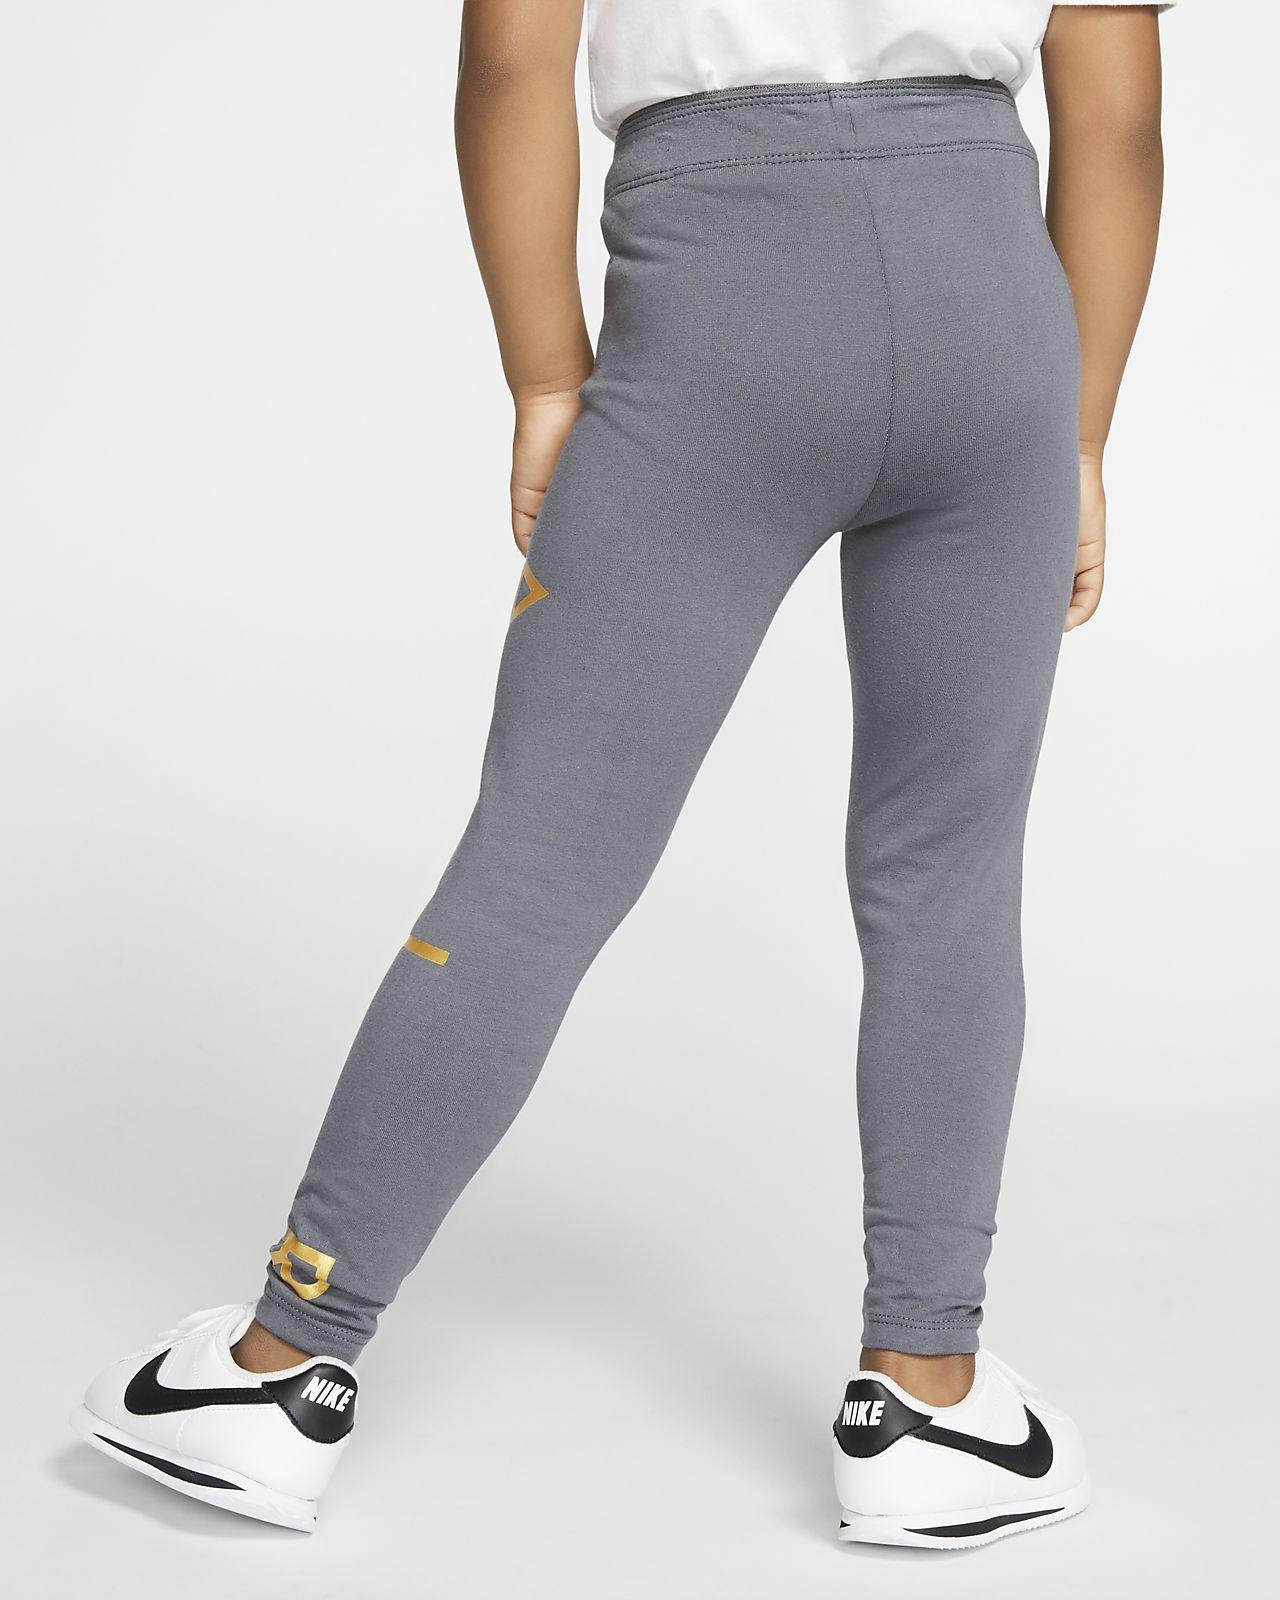 Legging Nike Sportswear Air pour Jeune enfant